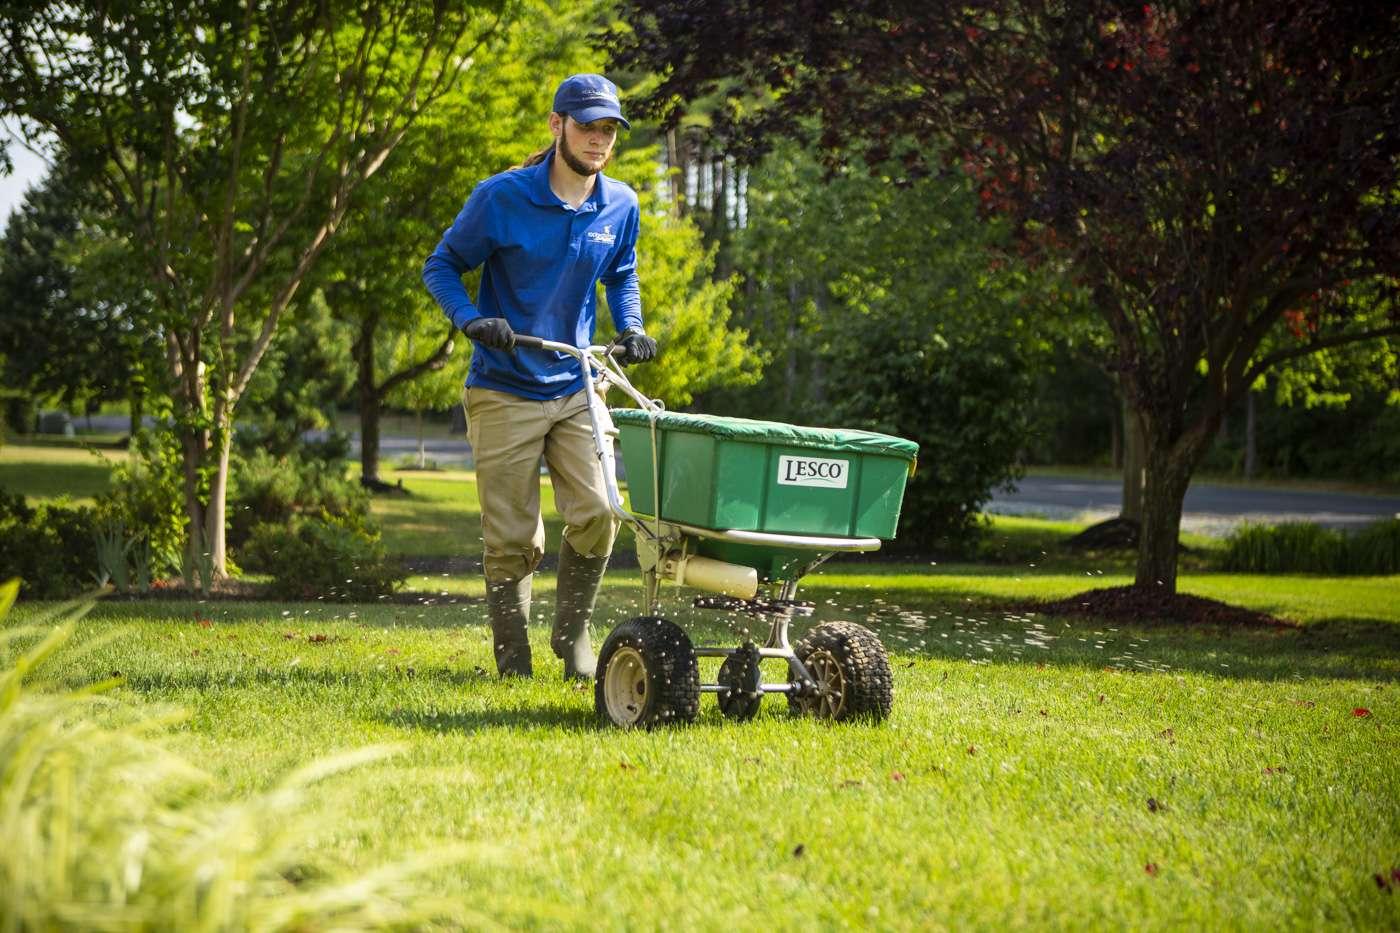 lawn care technician fertilizing lawn